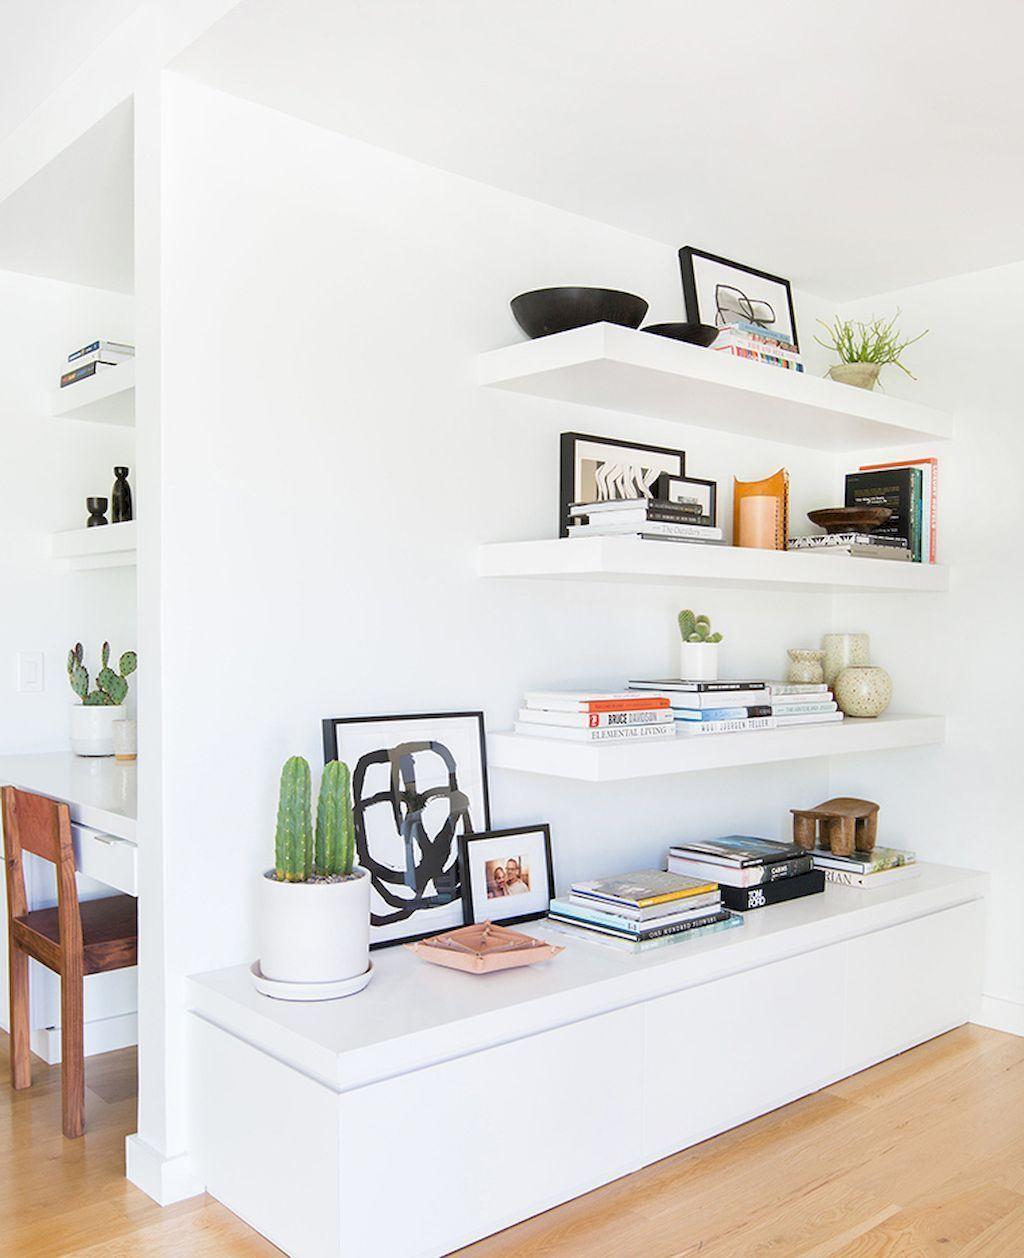 diy shelves floating and bookshelves ideas for your wall large living room kitchen etc floatingshelvesnursery floatingshelvesbathroomjoannagaines xbox shelf unit oak beam creative